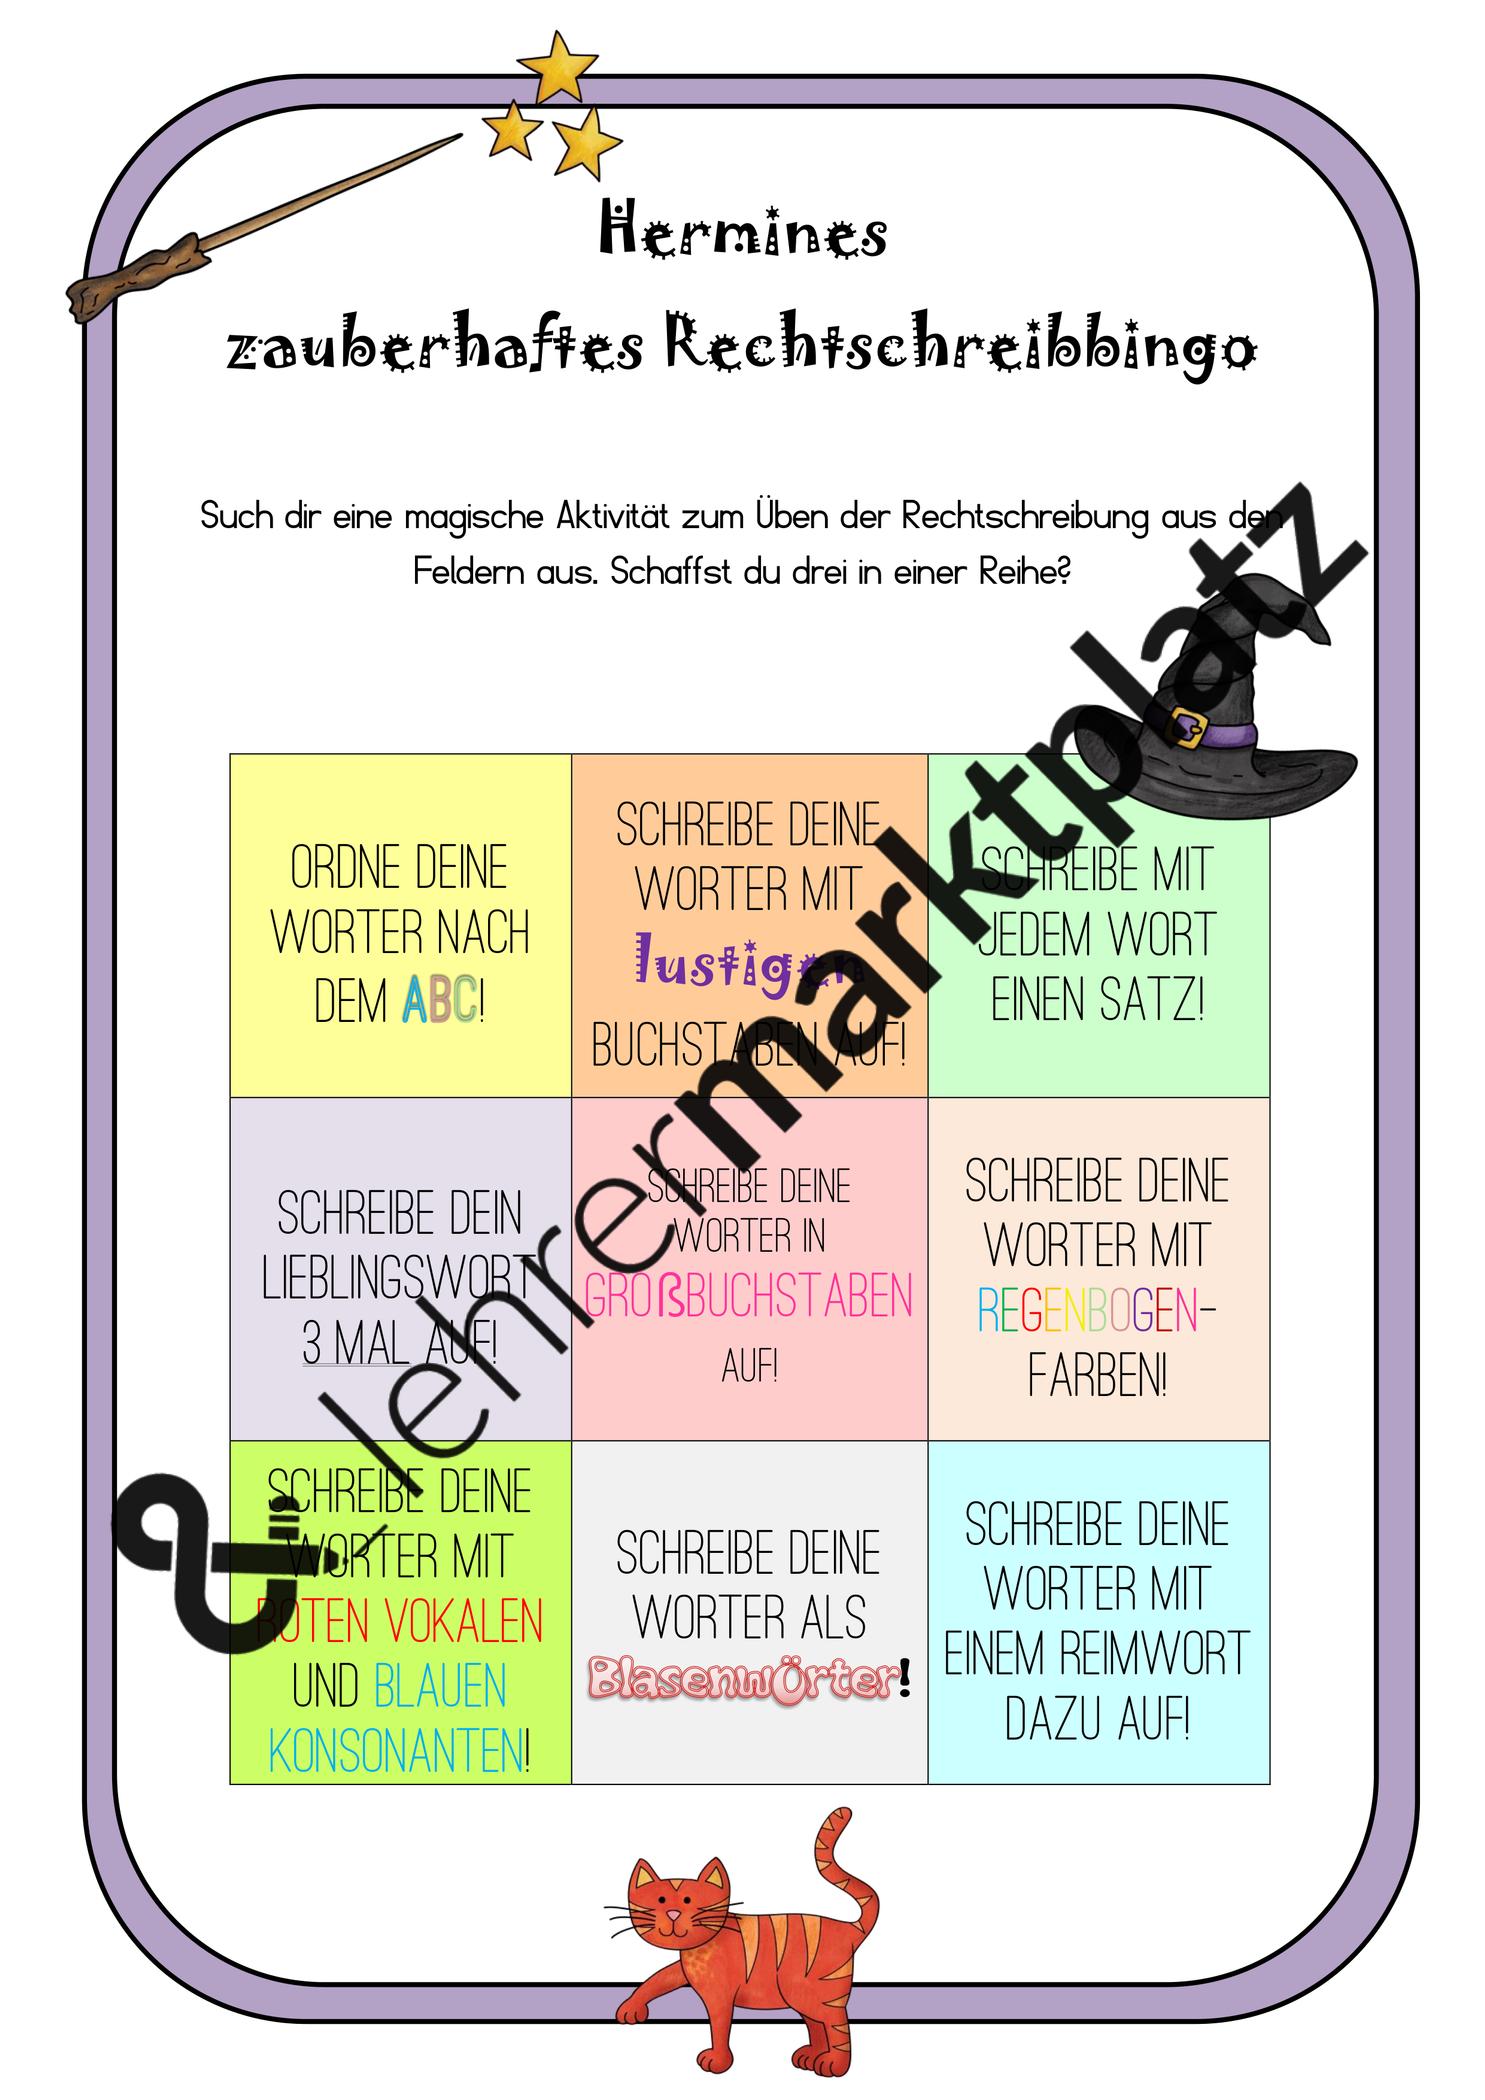 Hermines Zauberhaftes Rechtschreibbingo Harry Potter Unterrichtsmaterial Im Fach Deutsch Bingo Unterrichtsmaterial Lernen